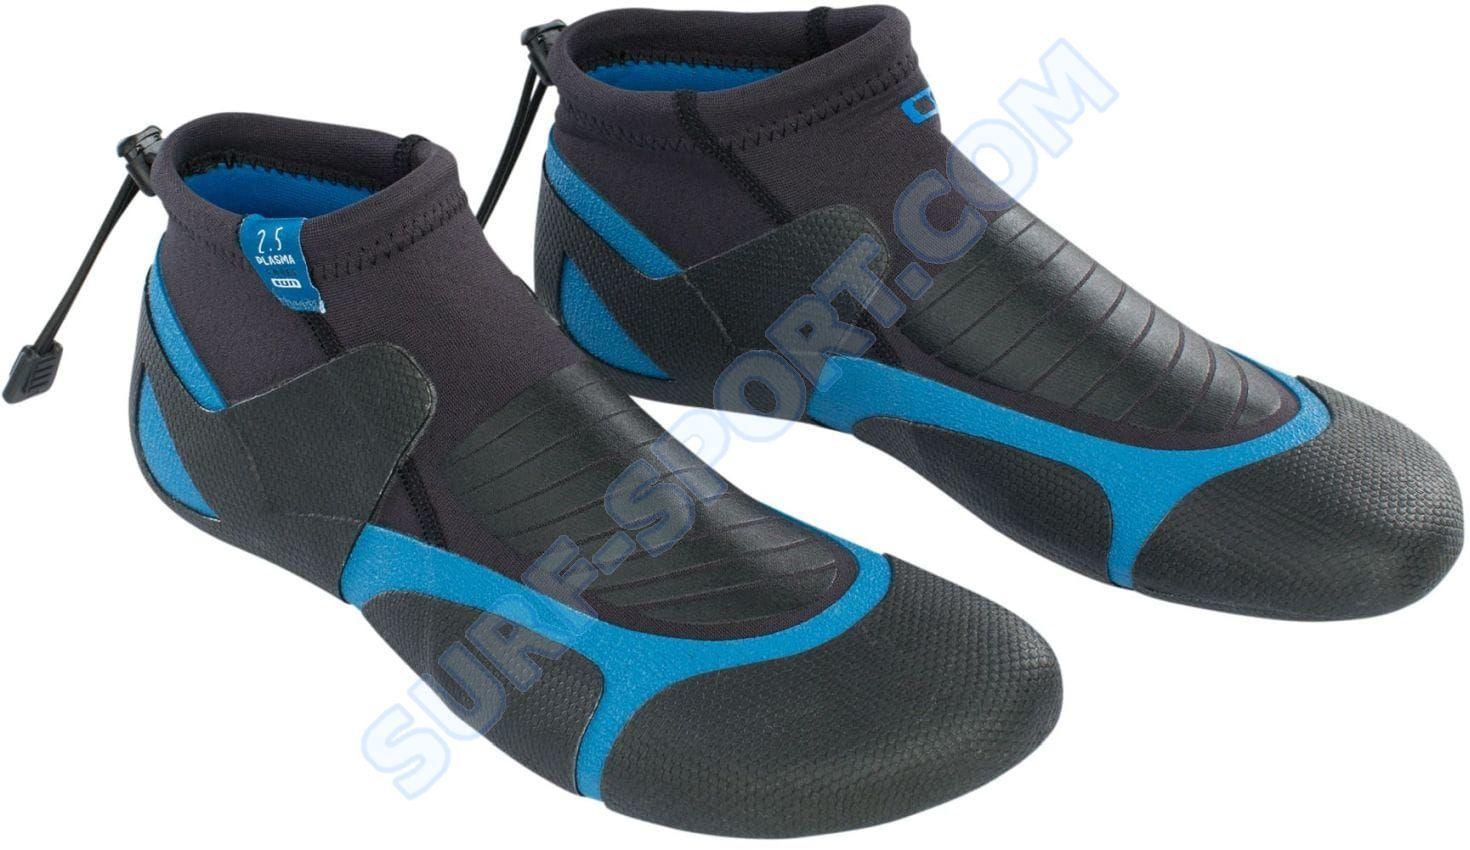 Buty Neoprenowe Niskie ION Plasma Shoes 2.5 RT -2021 Black/Blue